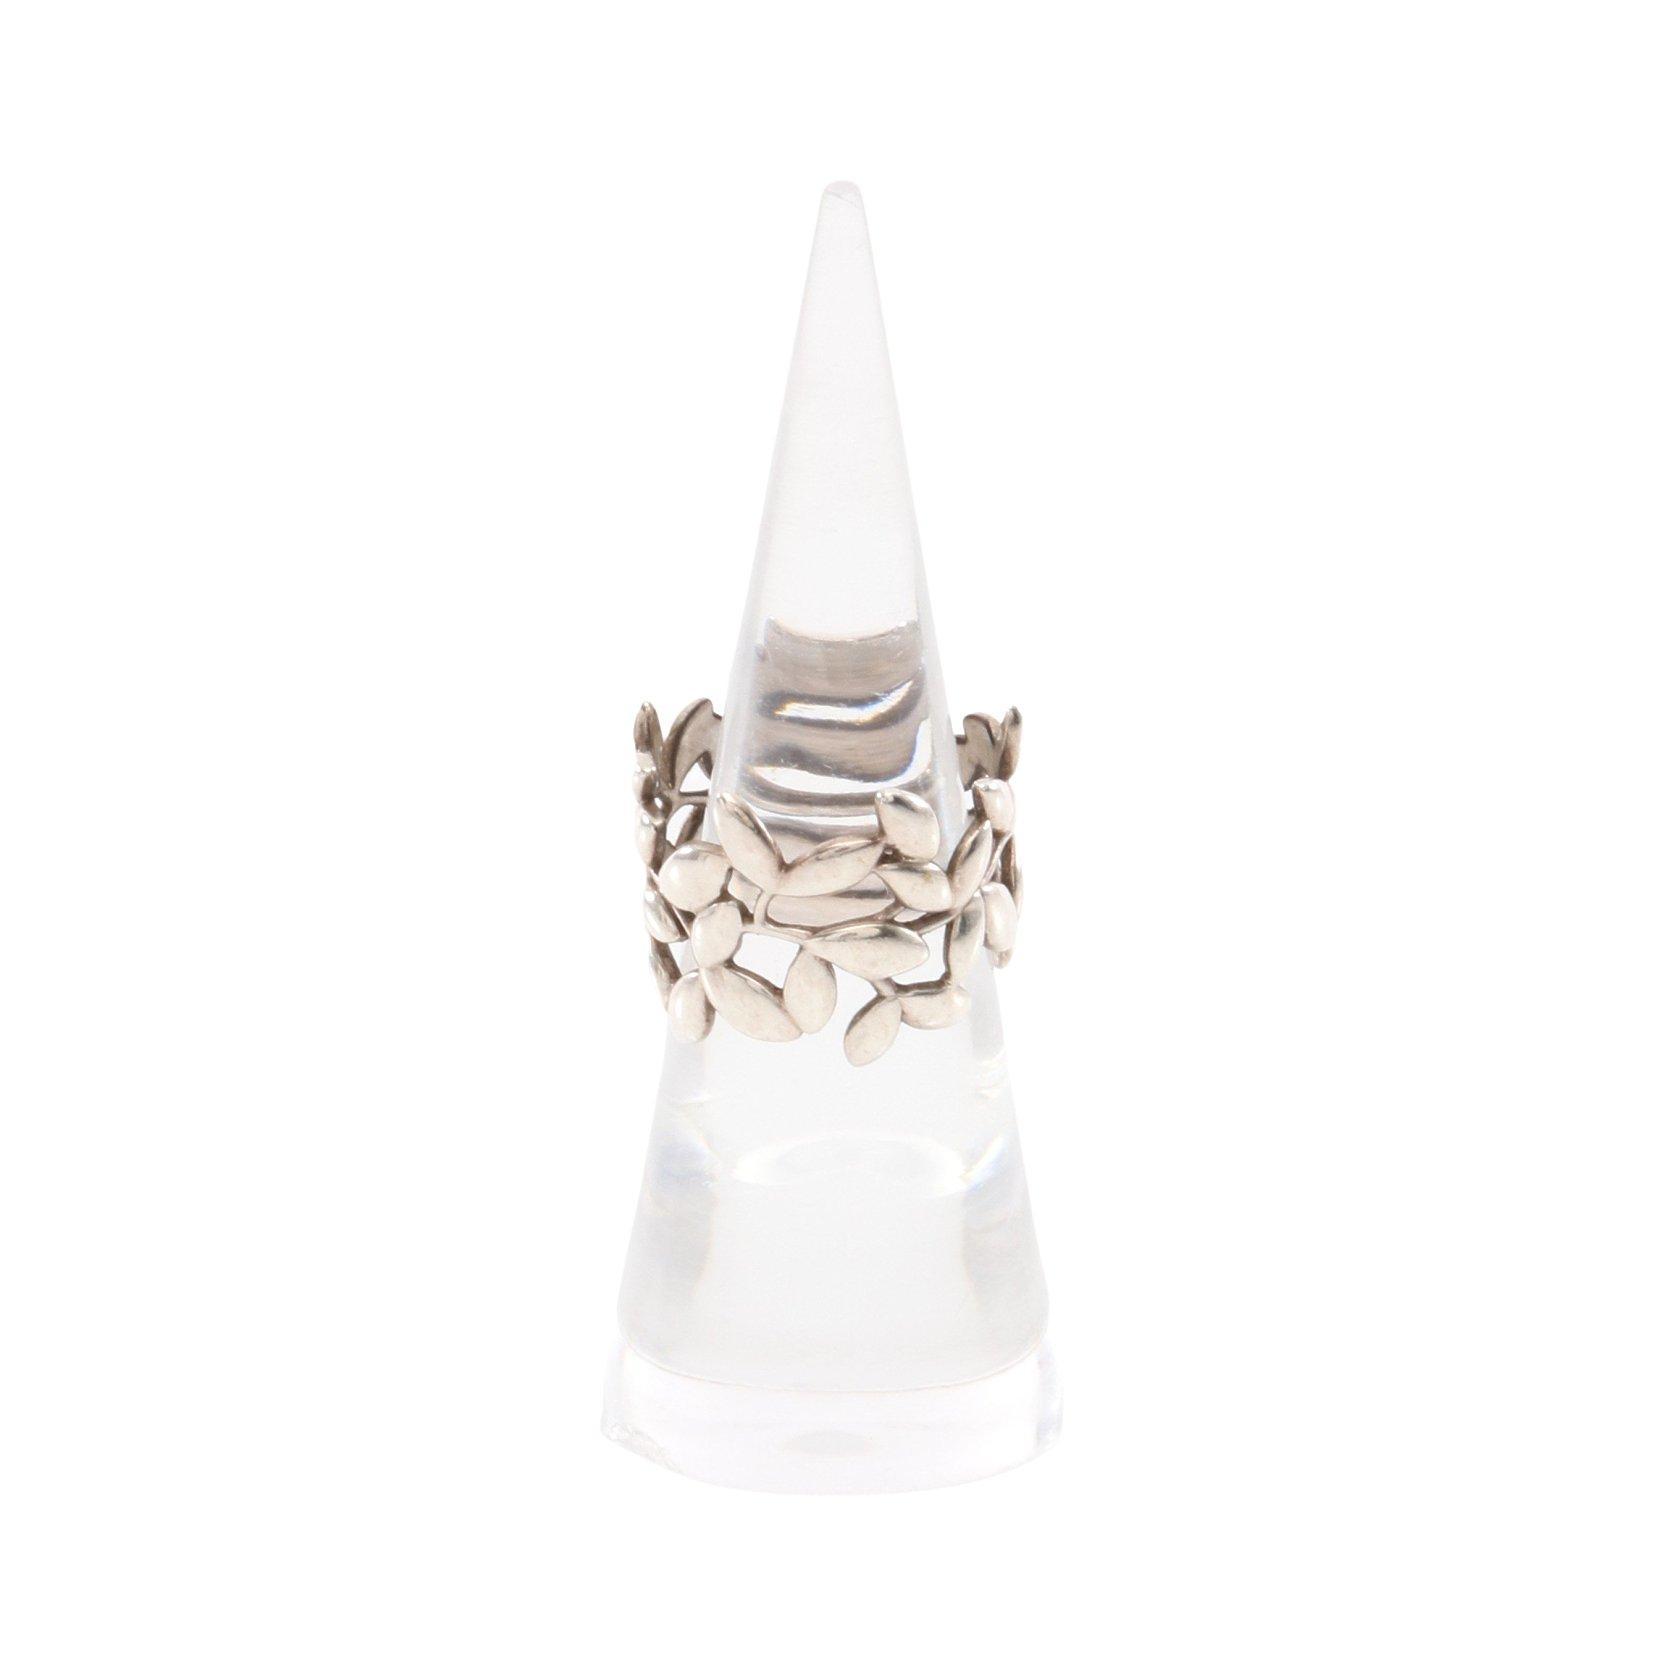 TIFFANY & Co.・アクセサリー・オリーブ リーフ パロマピカソ リング 指輪 SV925 シルバー